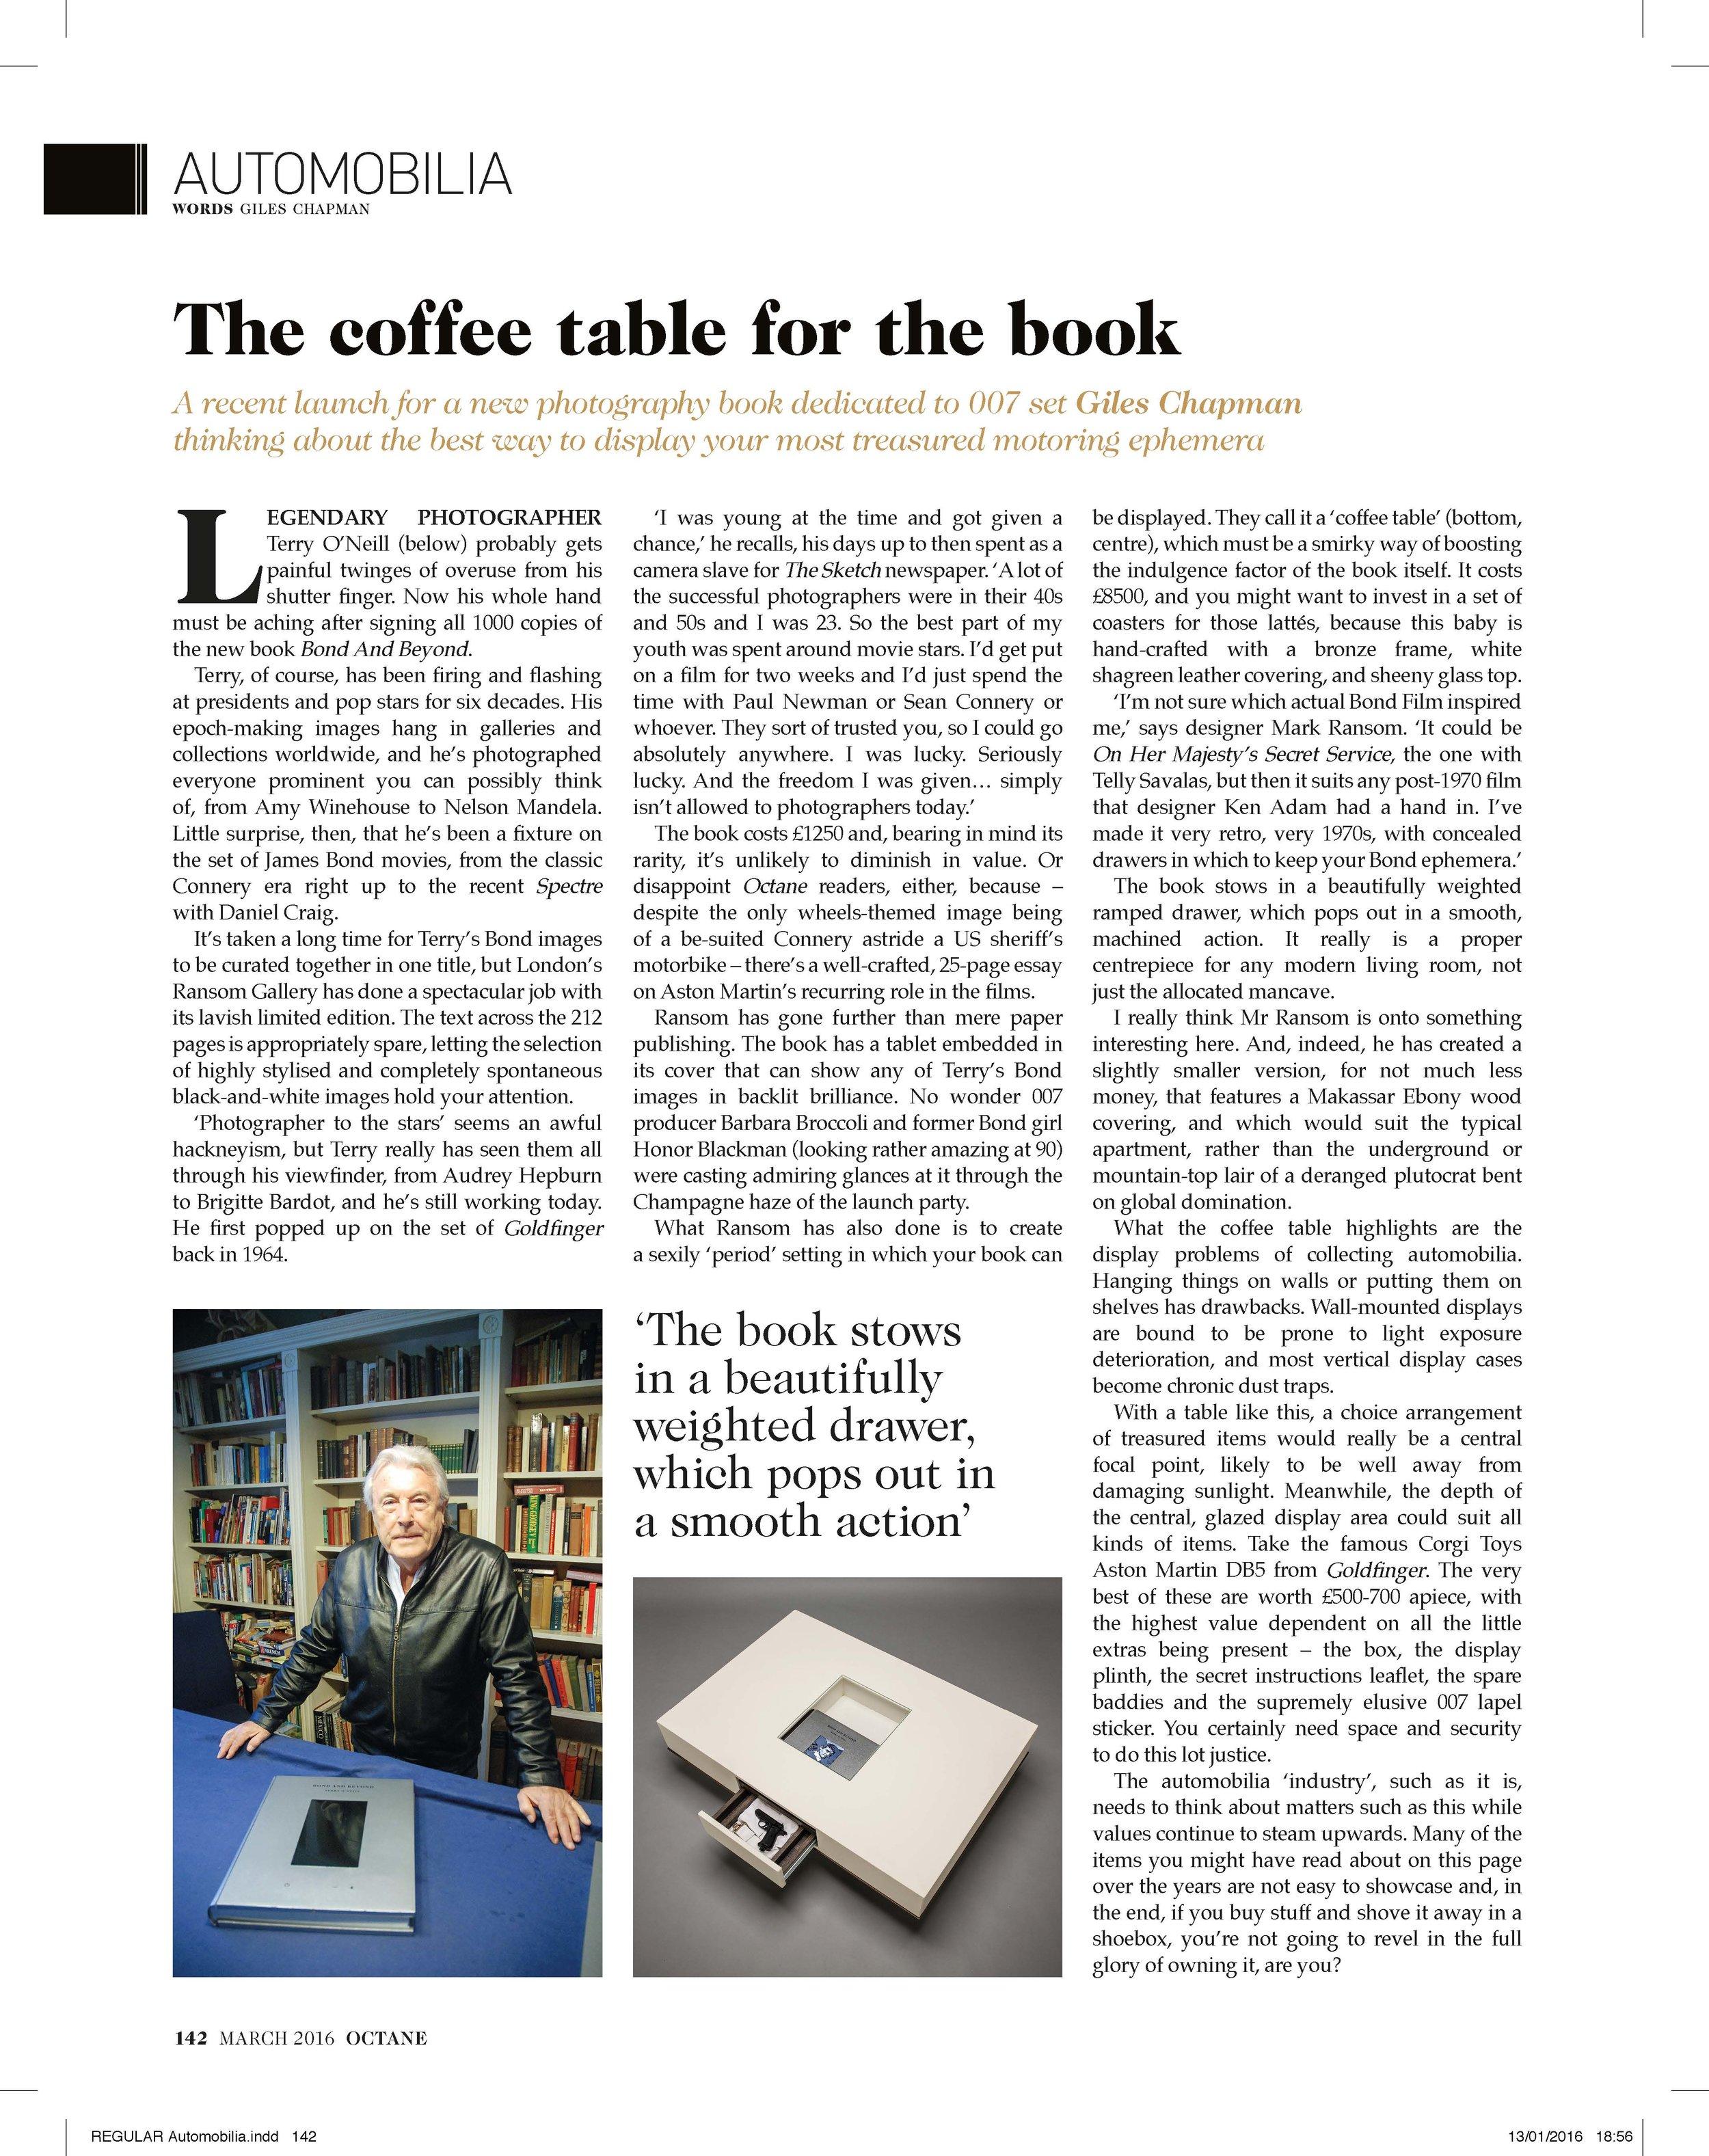 Automobilia - BOND & BEYOND Book & Coffee Table at Ransom Art